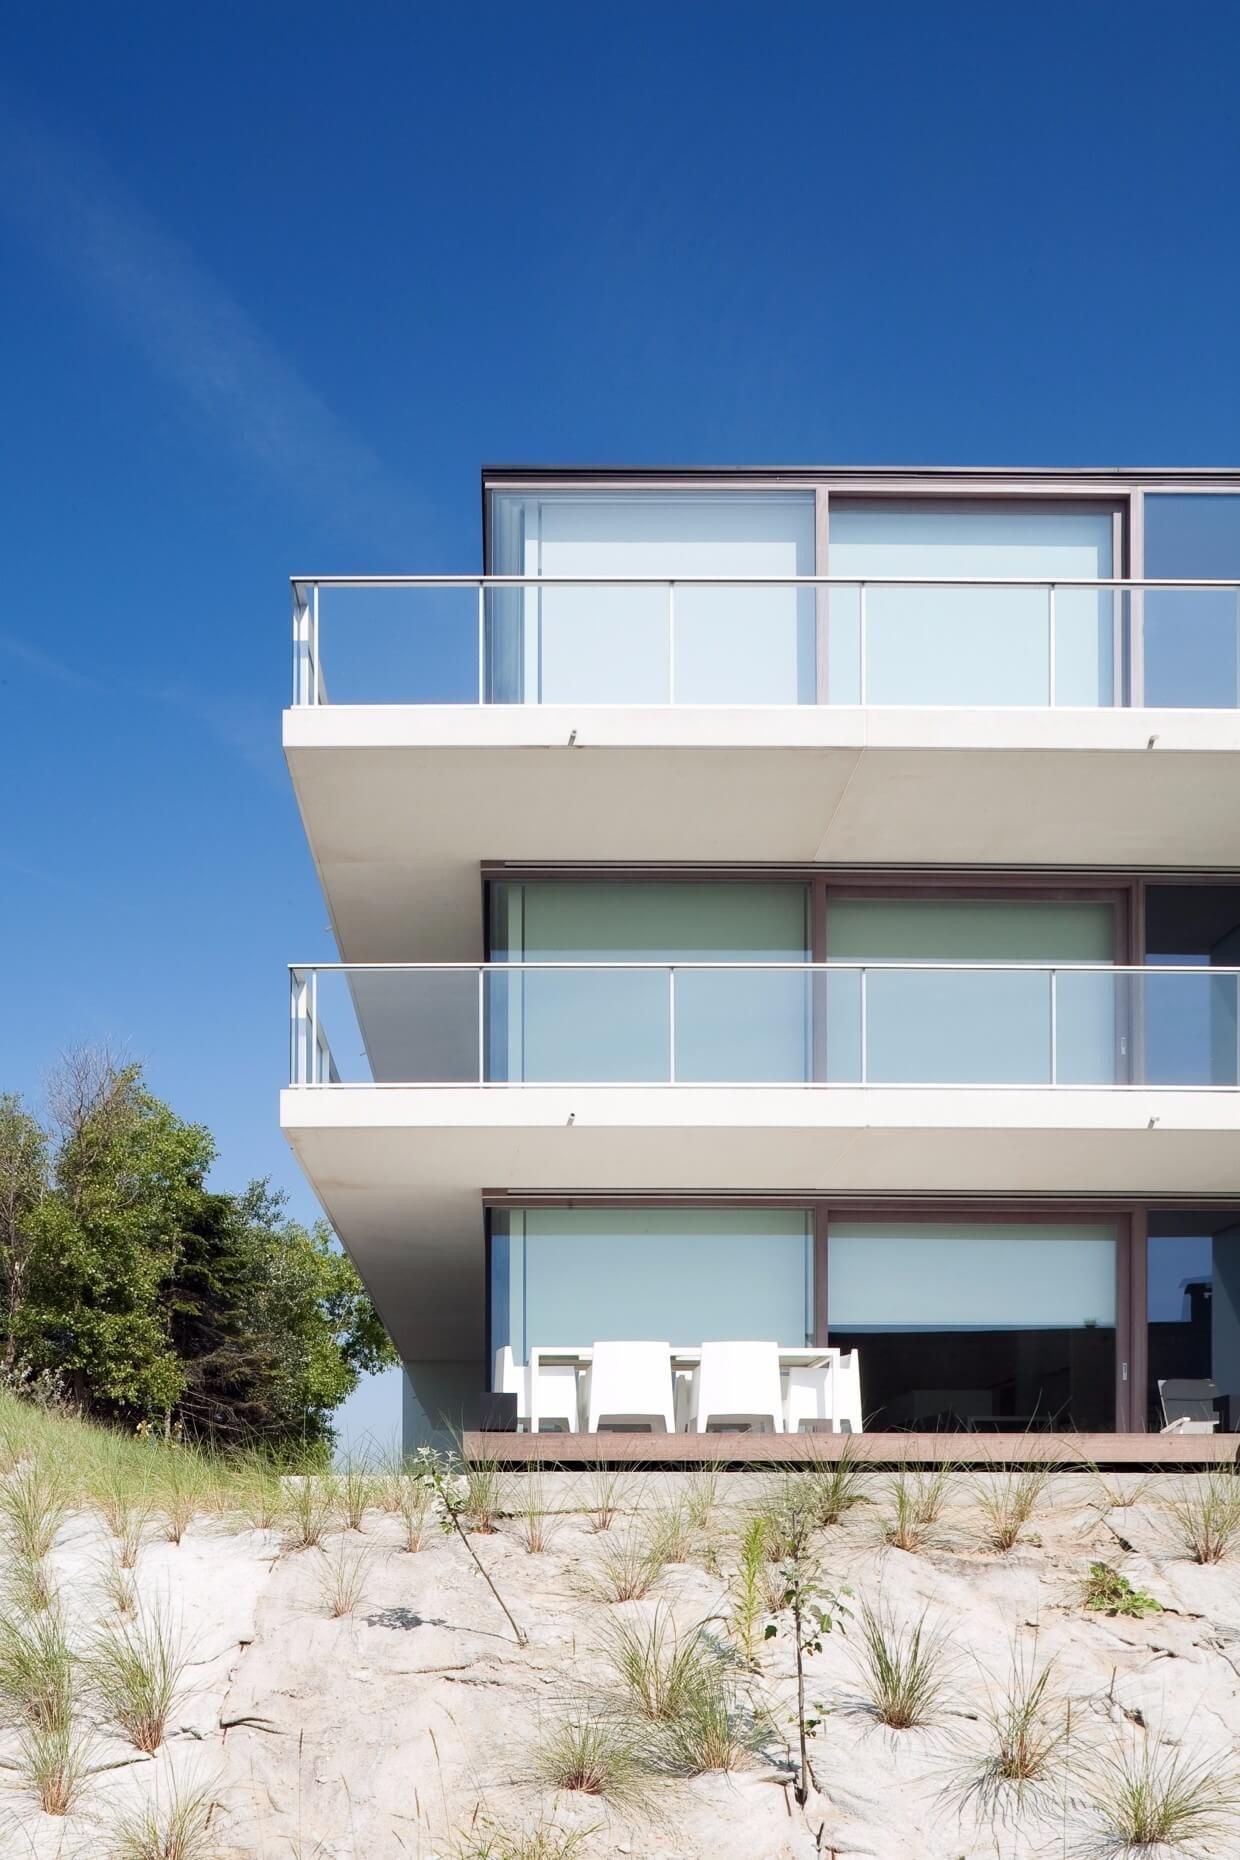 Rietveldprojects-Periscoop-appartement-design-architectuur-kust16